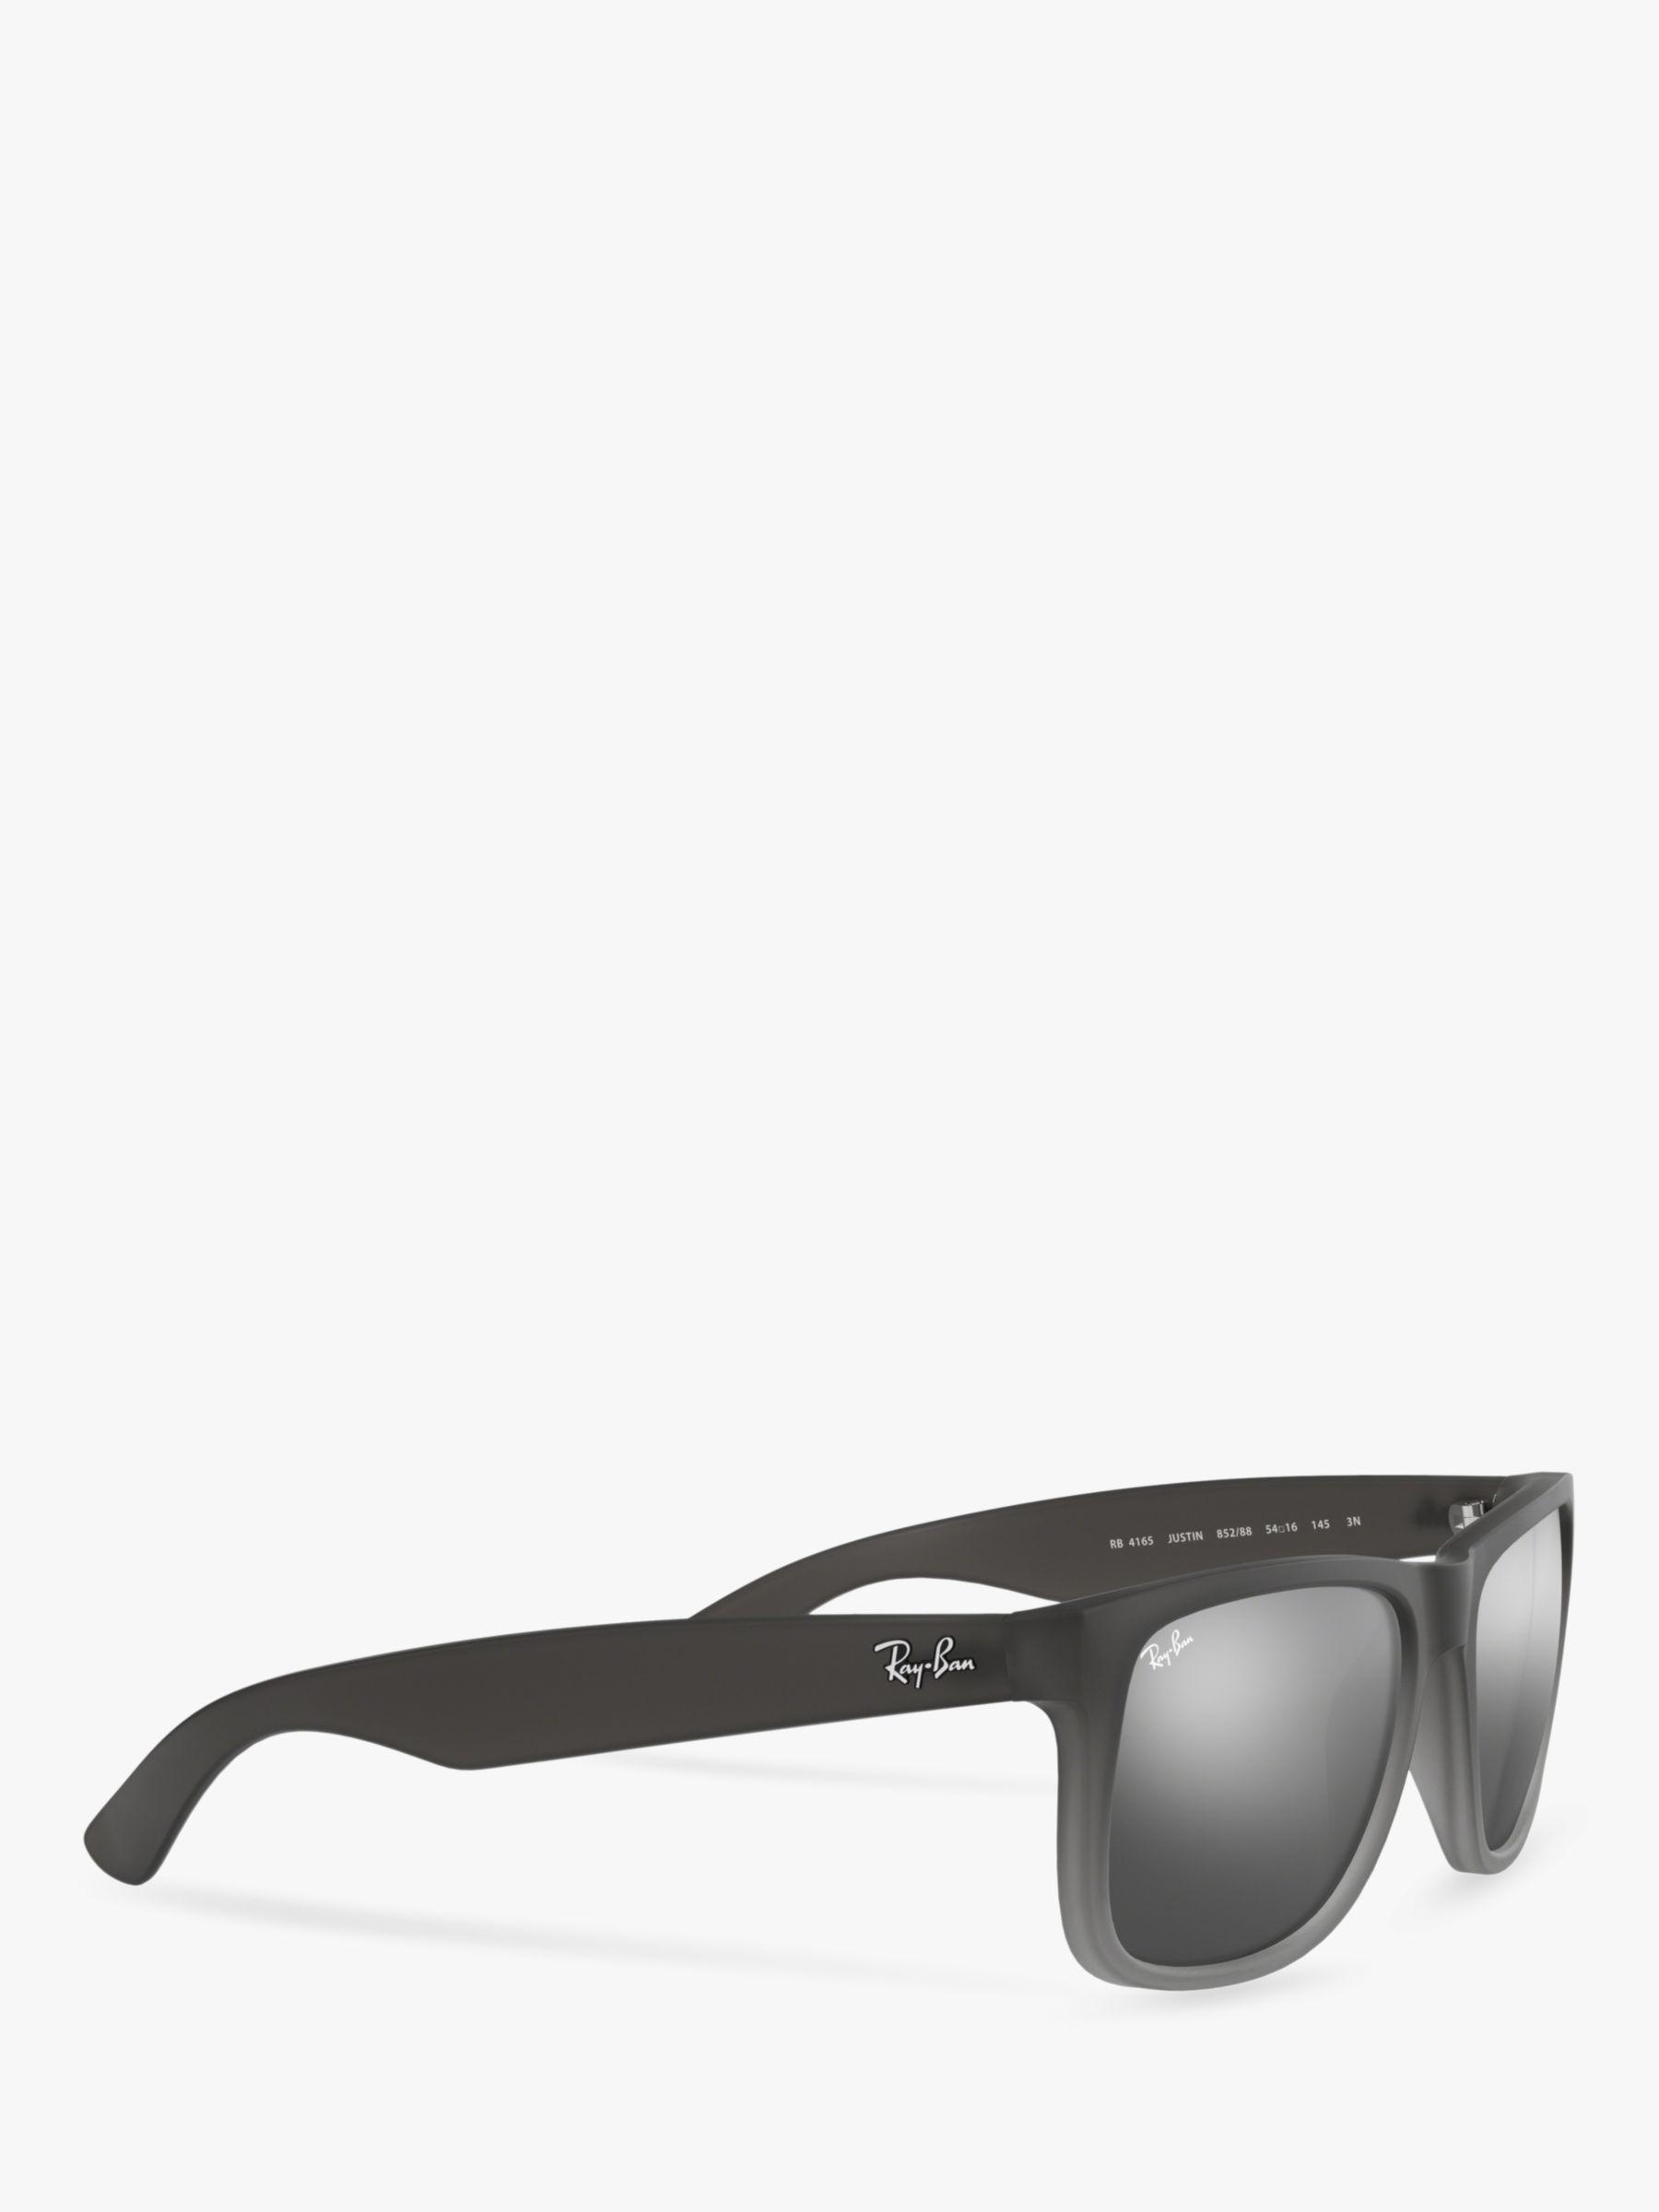 300b460a1f Ray-Ban - Gray Rb4165 Men s Justin Rectangular Sunglasses for Men - Lyst.  View fullscreen